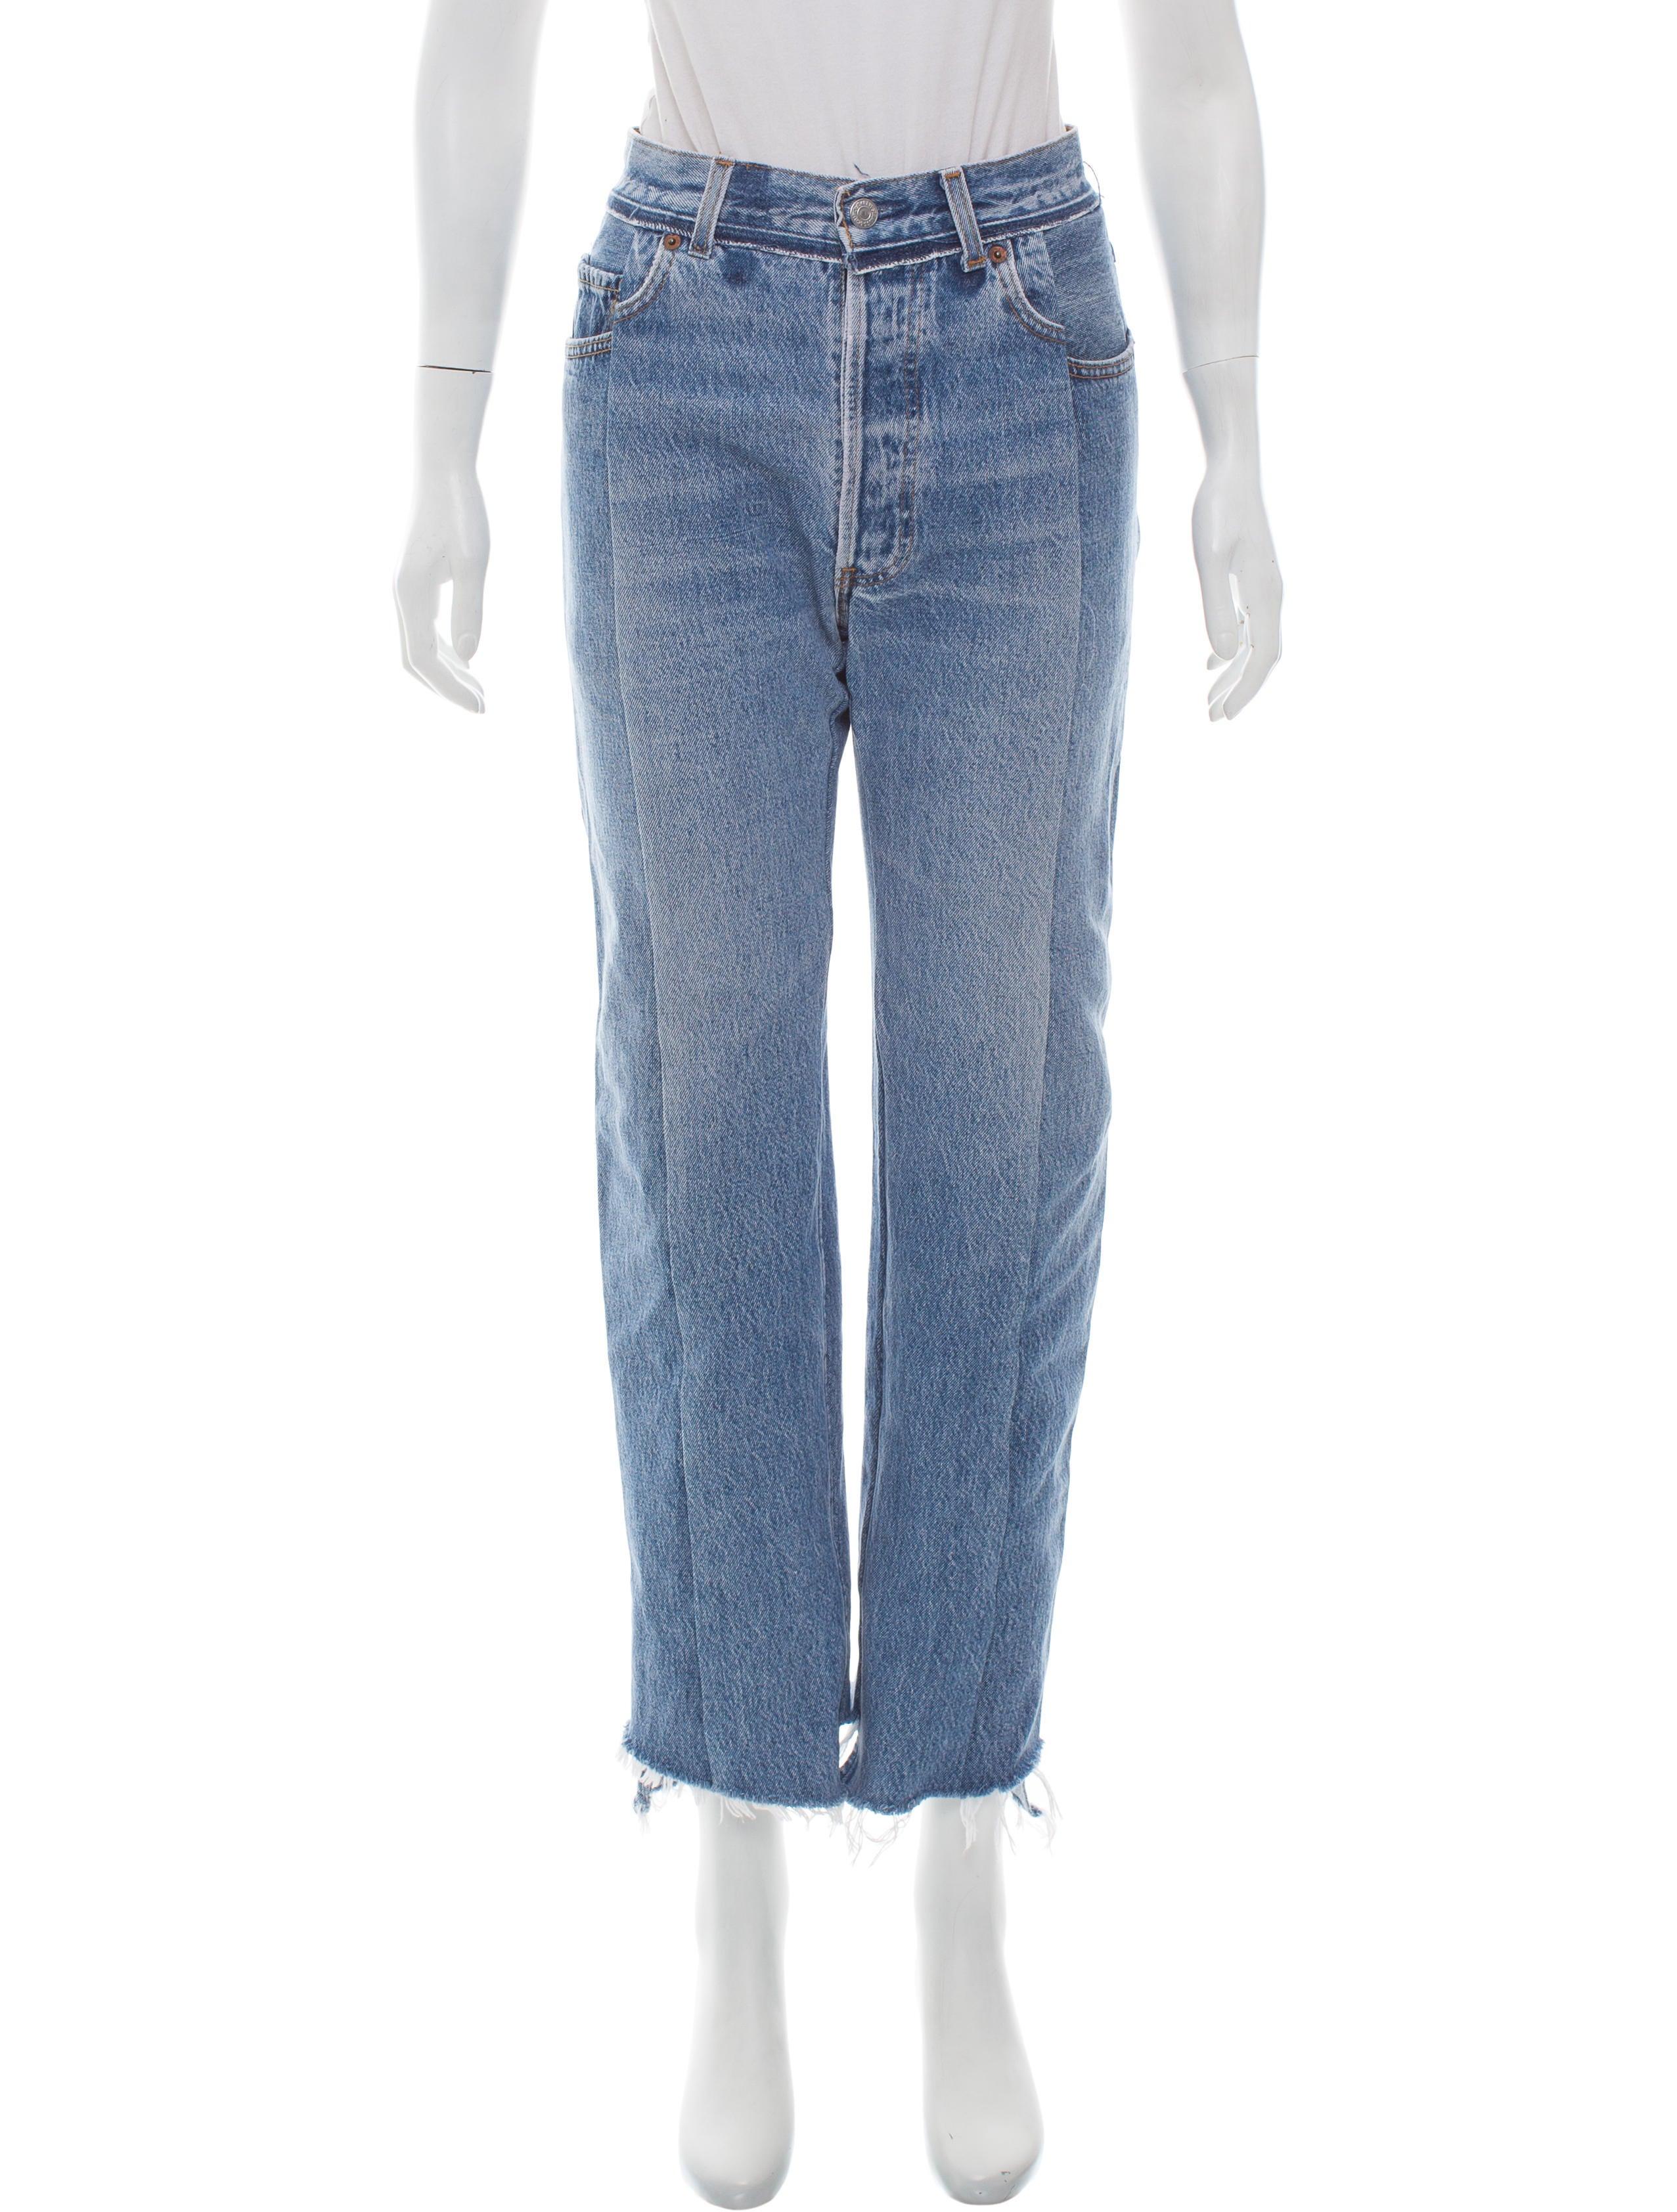 Vetements 2016 Season 1 Mid-Rise Jeans